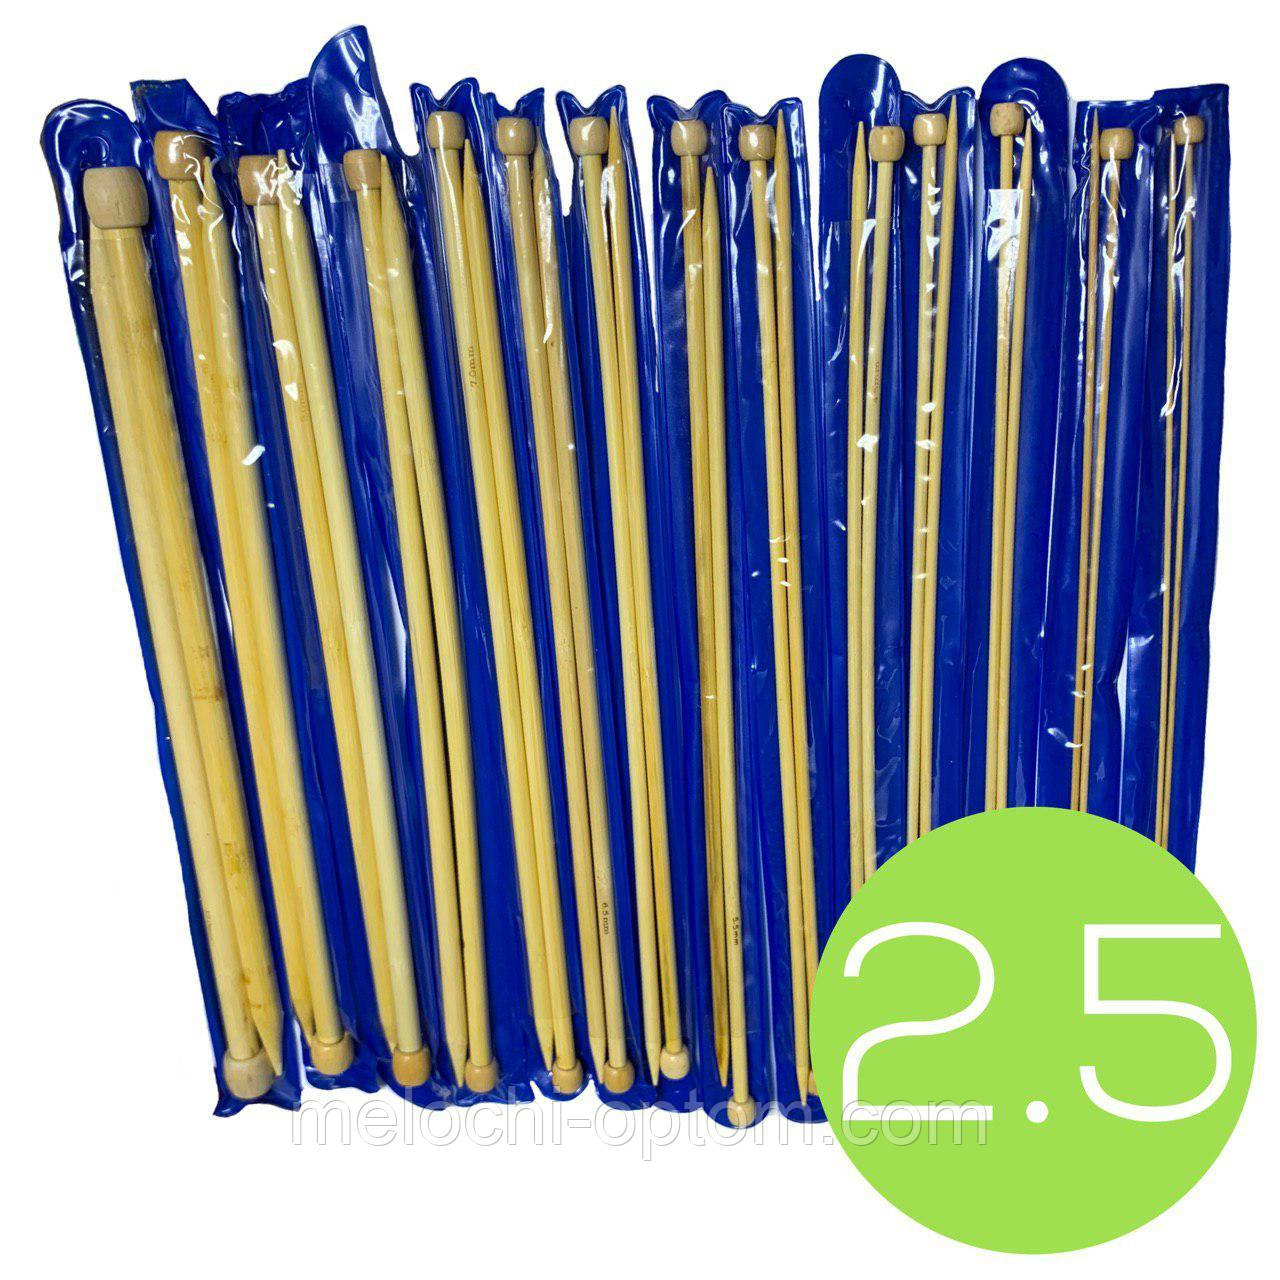 Спицы для вязания №2.5 (350mm) бамбуковые